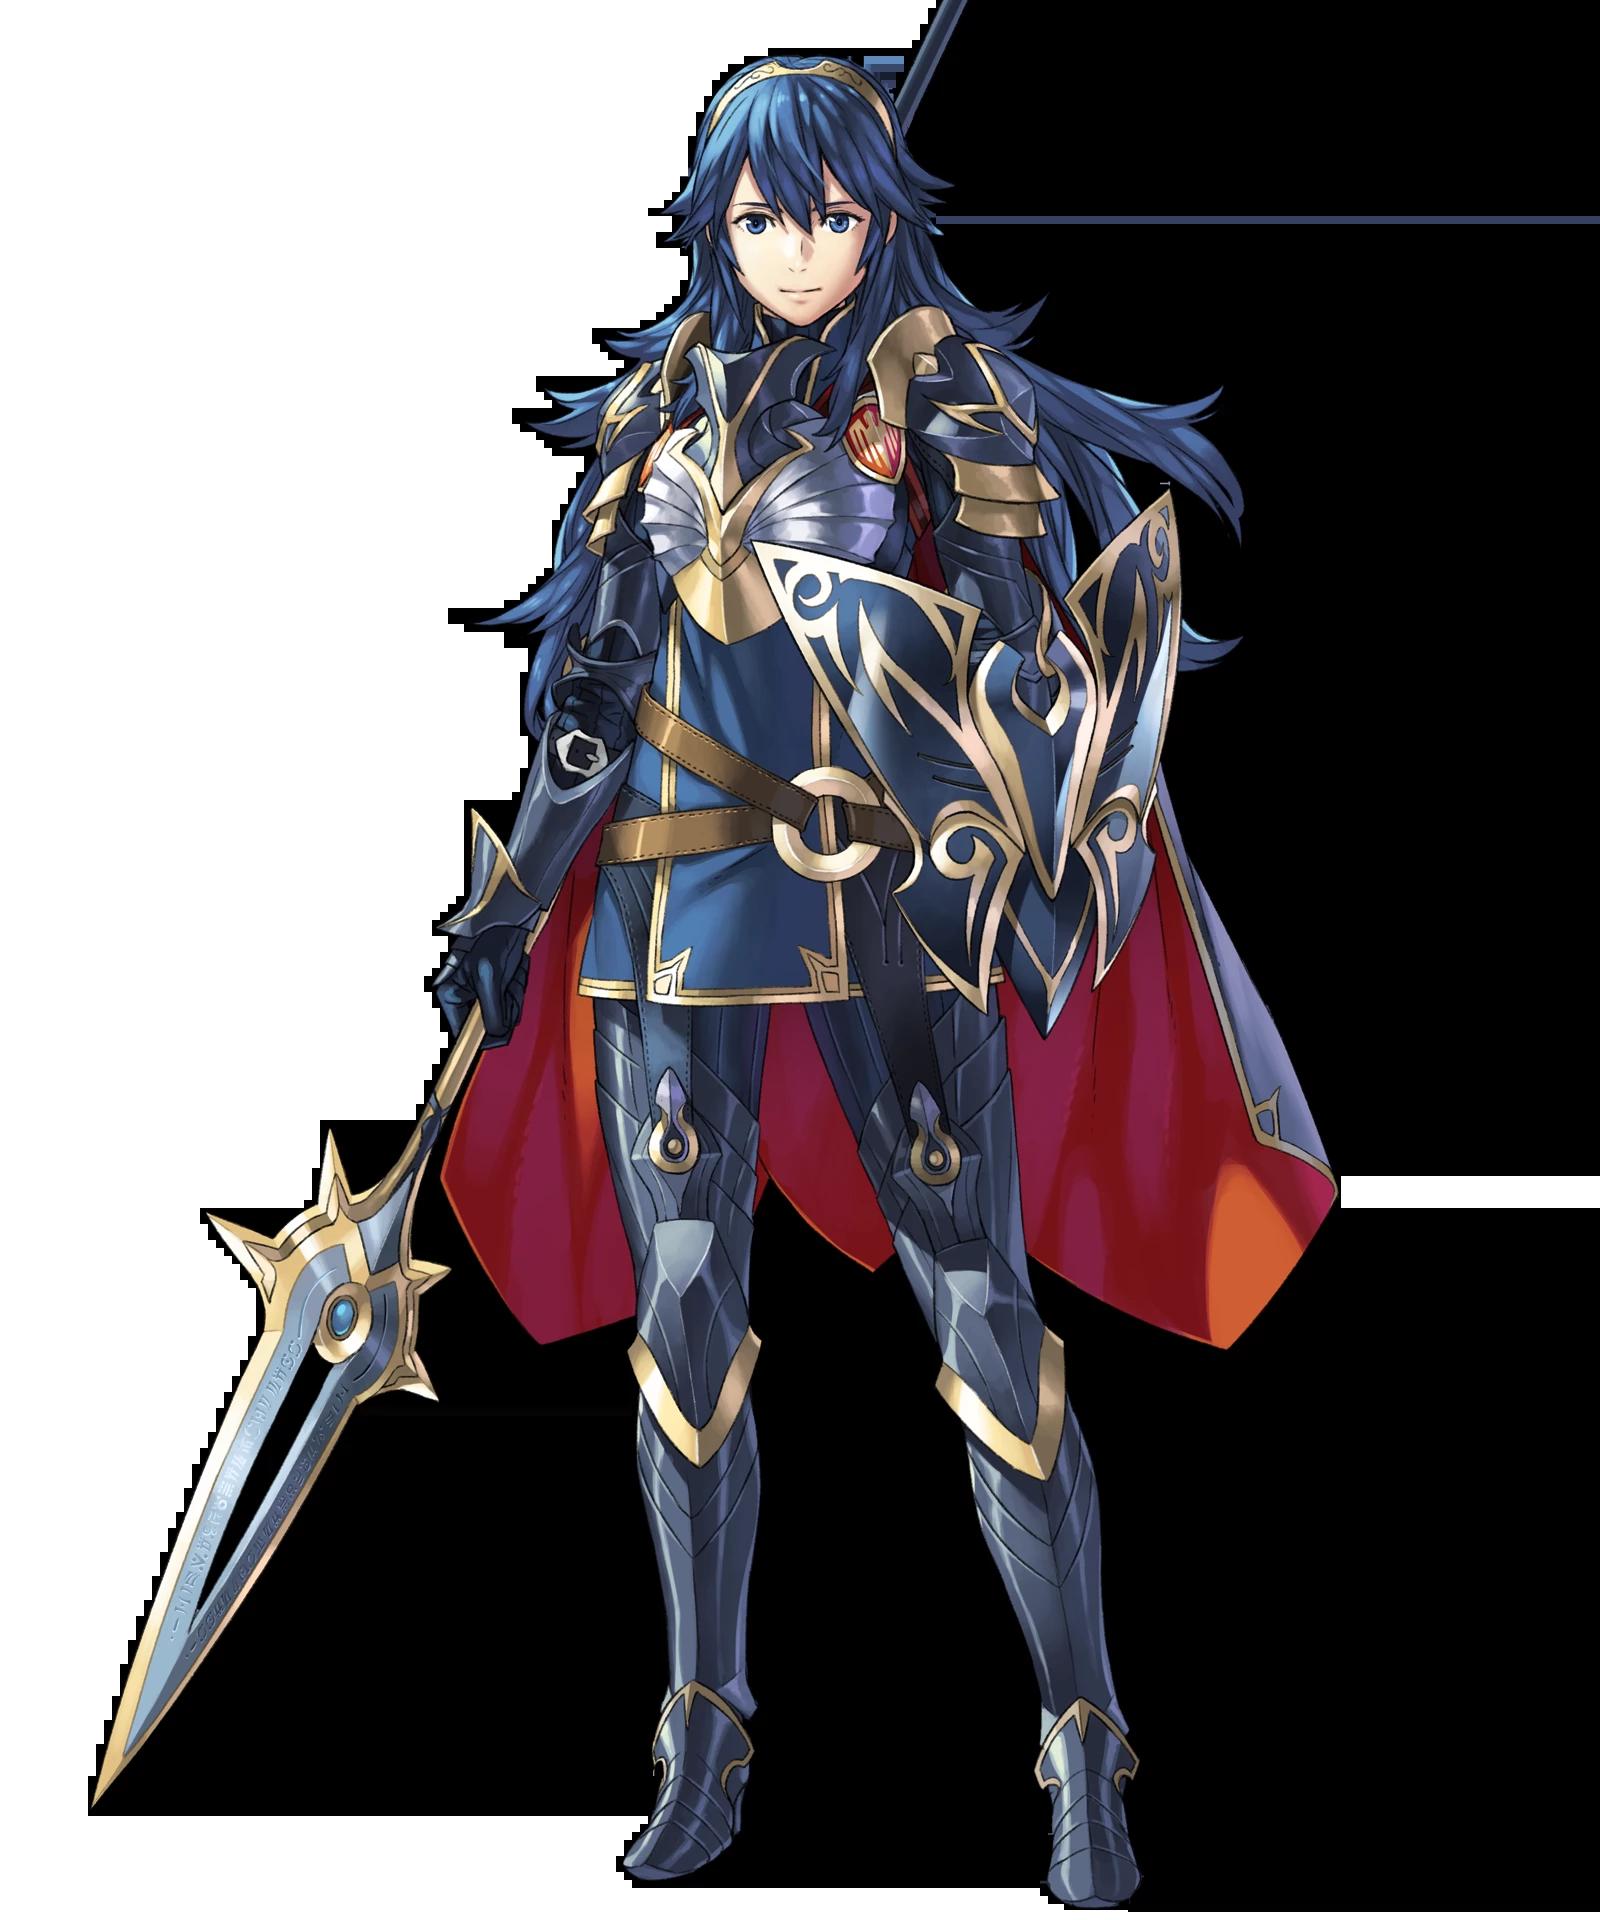 Brave Lucina | Fire Emblem Heroes Wiki - GamePress